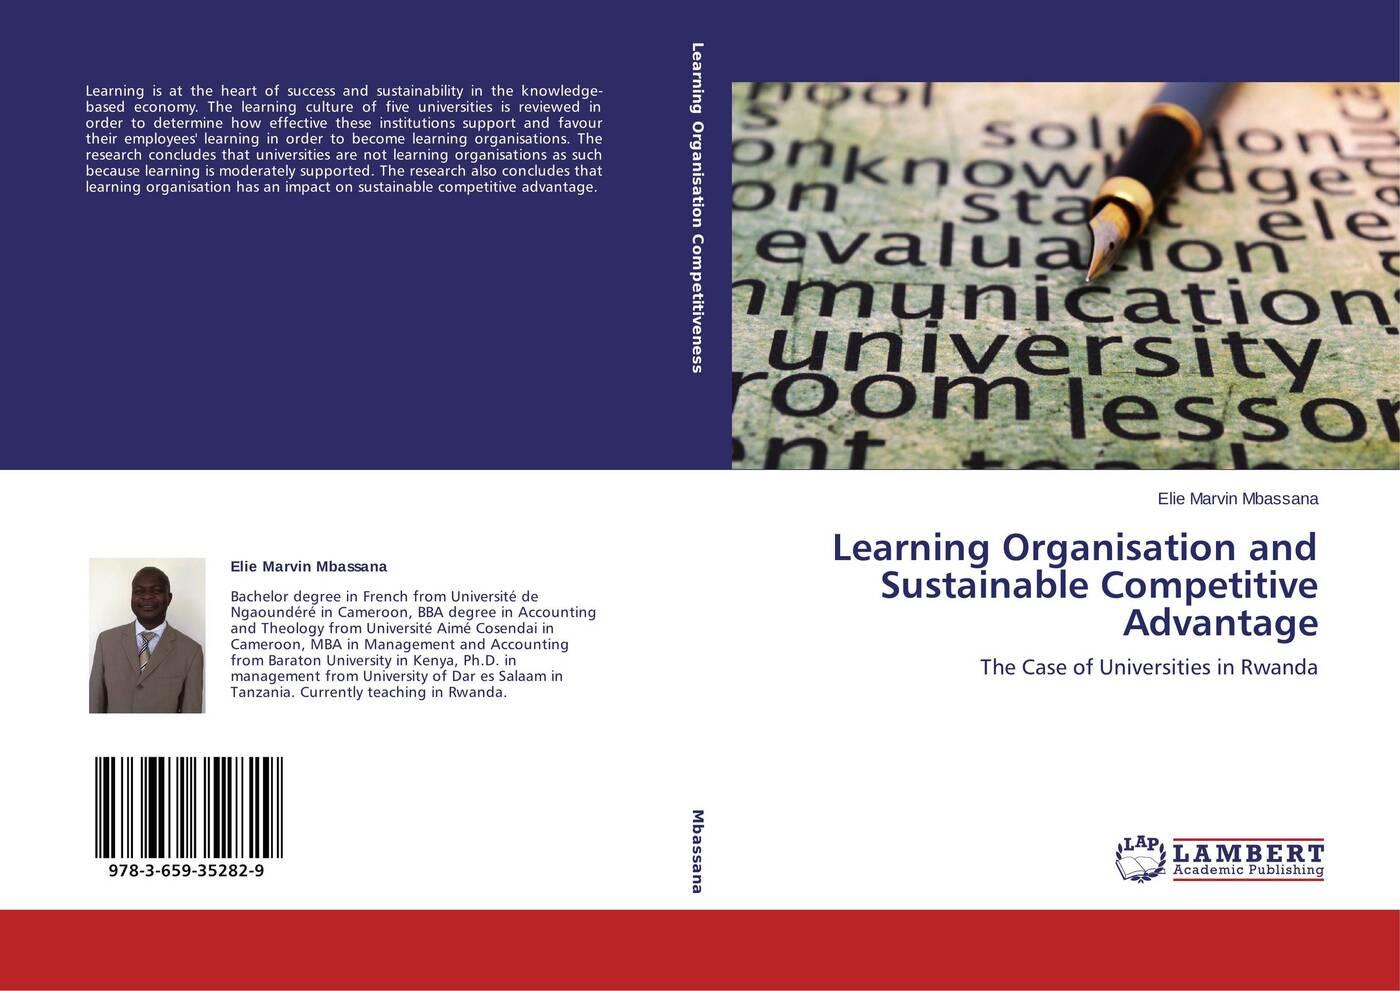 Elie Marvin Mbassana Learning Organisation and Sustainable Competitive Advantage avlonas nikos practical sustainability strategies how to gain a competitive advantage